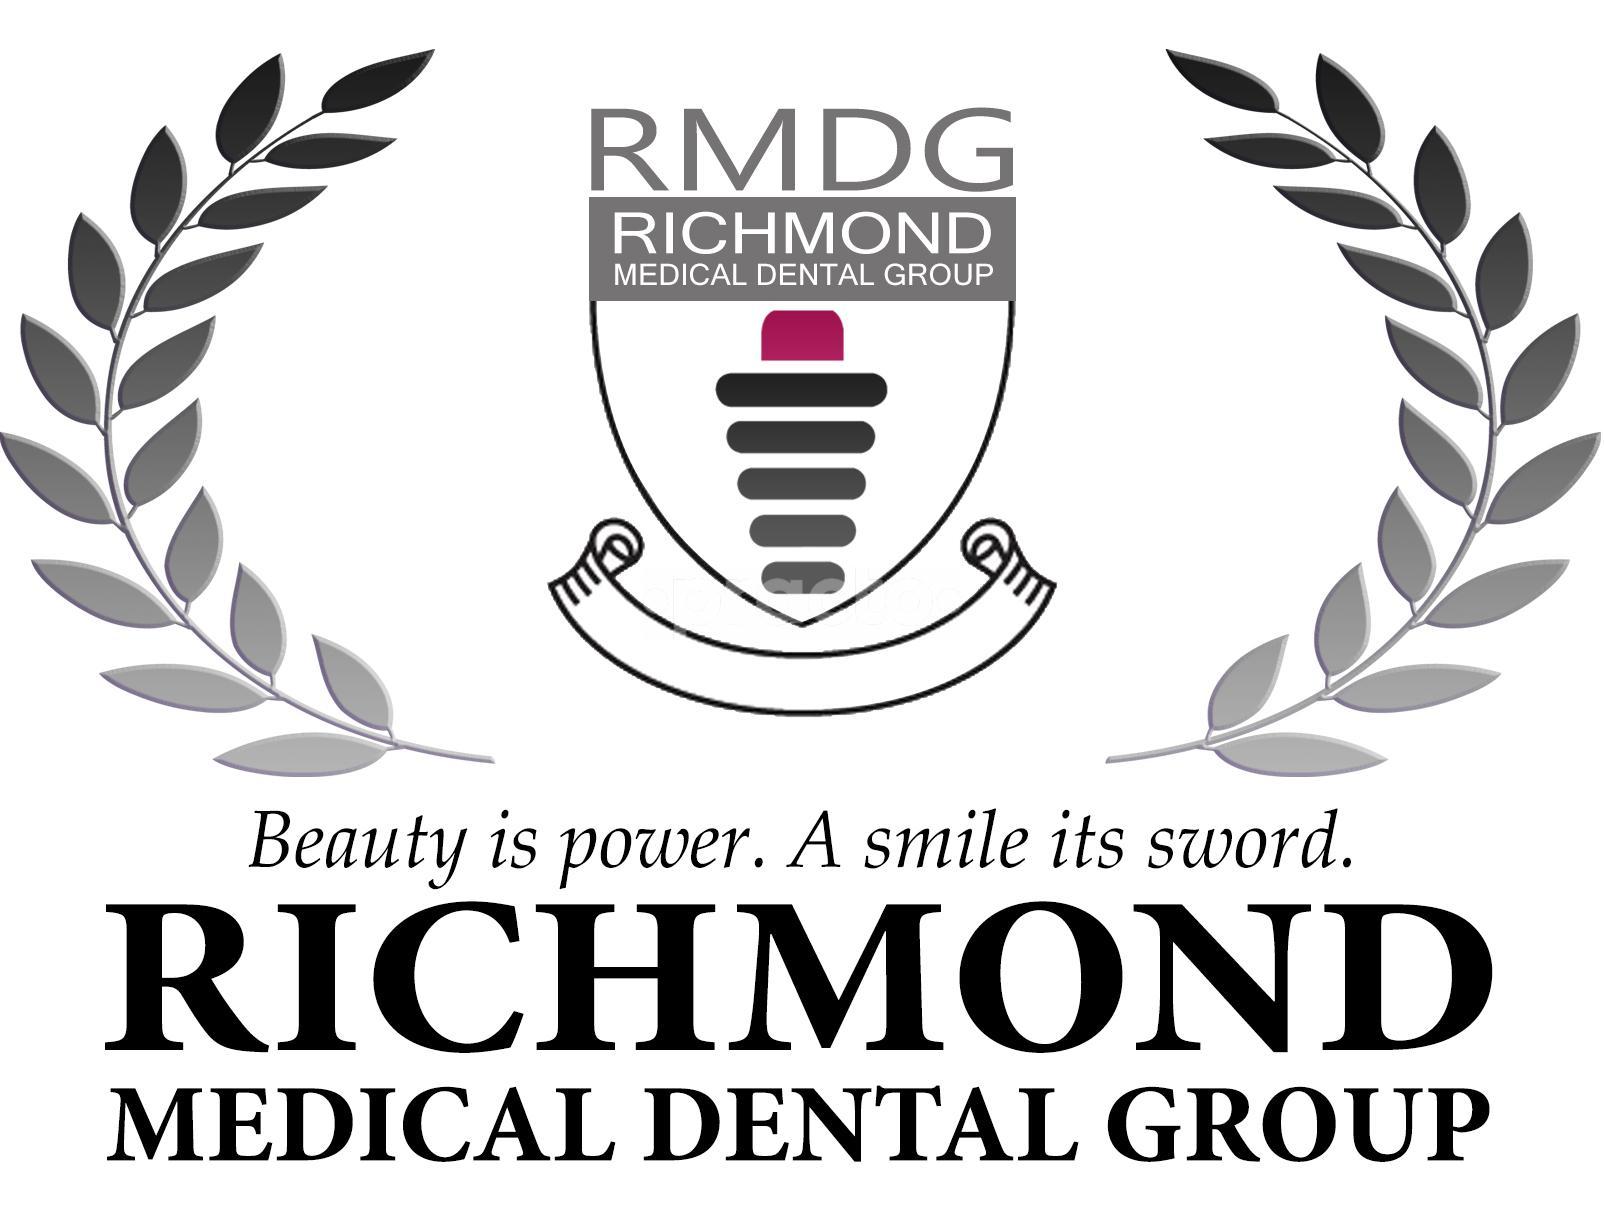 Richmond Medical Dental Group (RMDG)